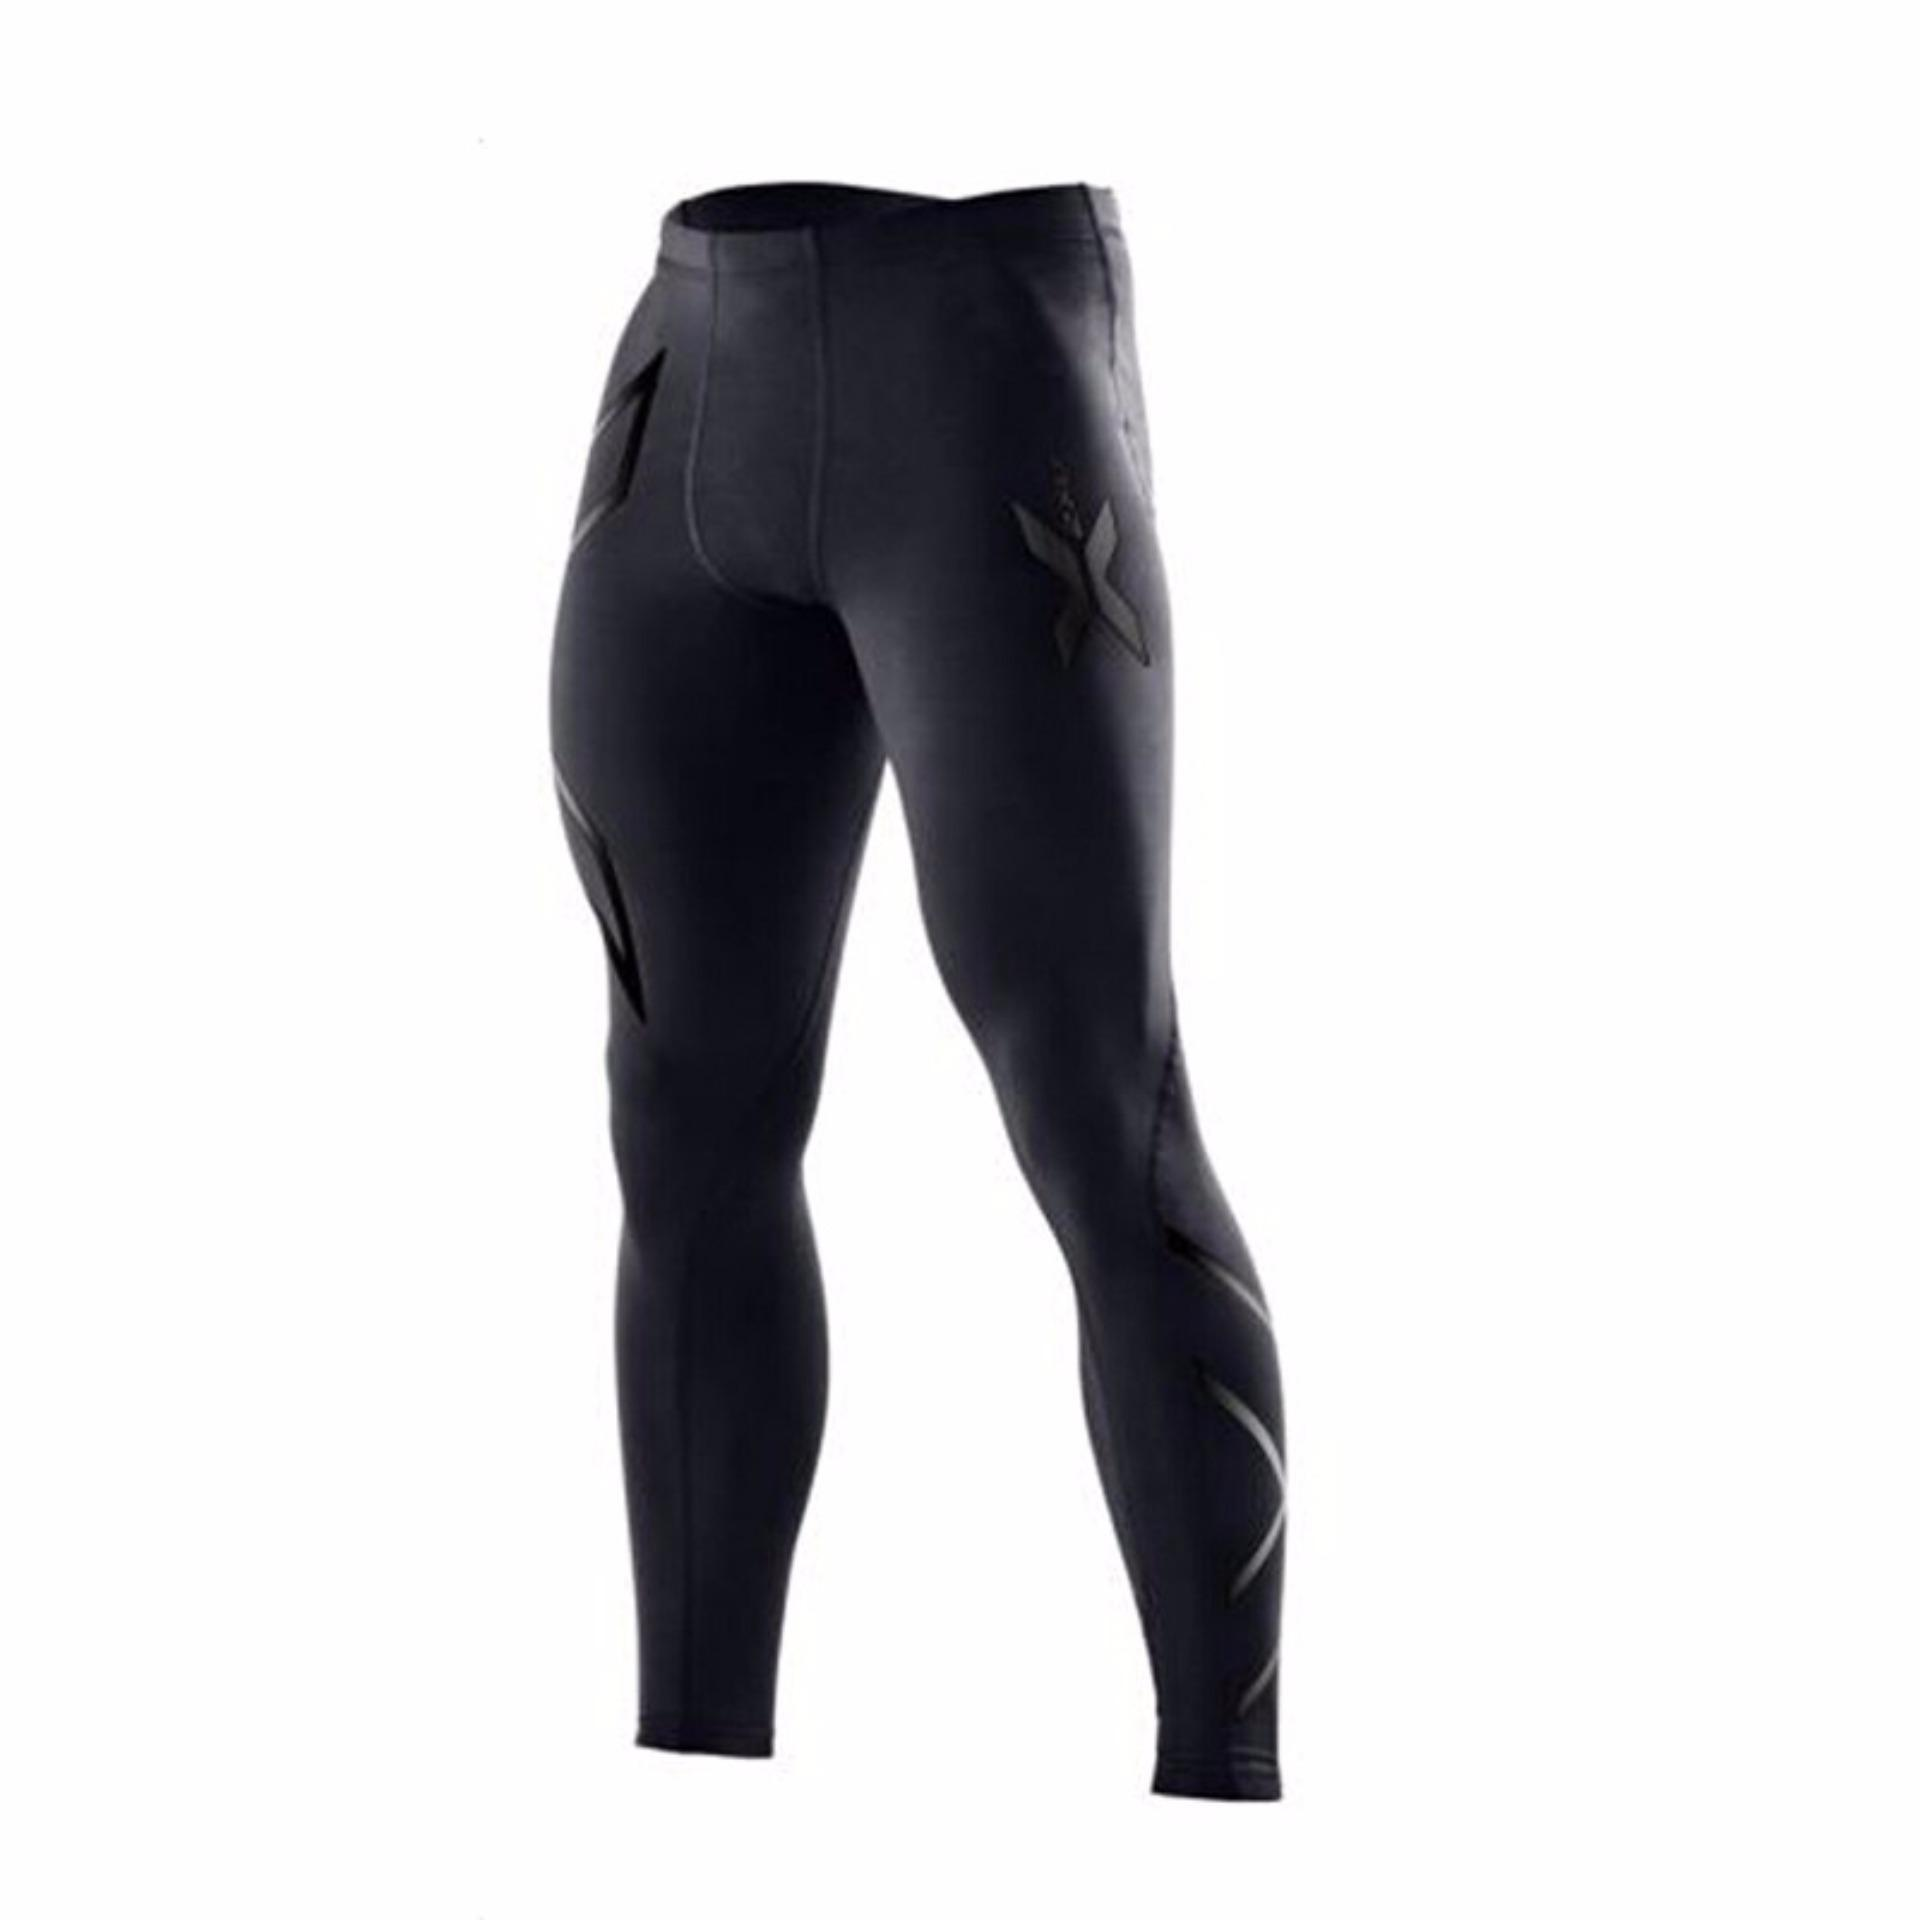 Celana olahraga pria celana santai pria menjalankan pusat celana International .